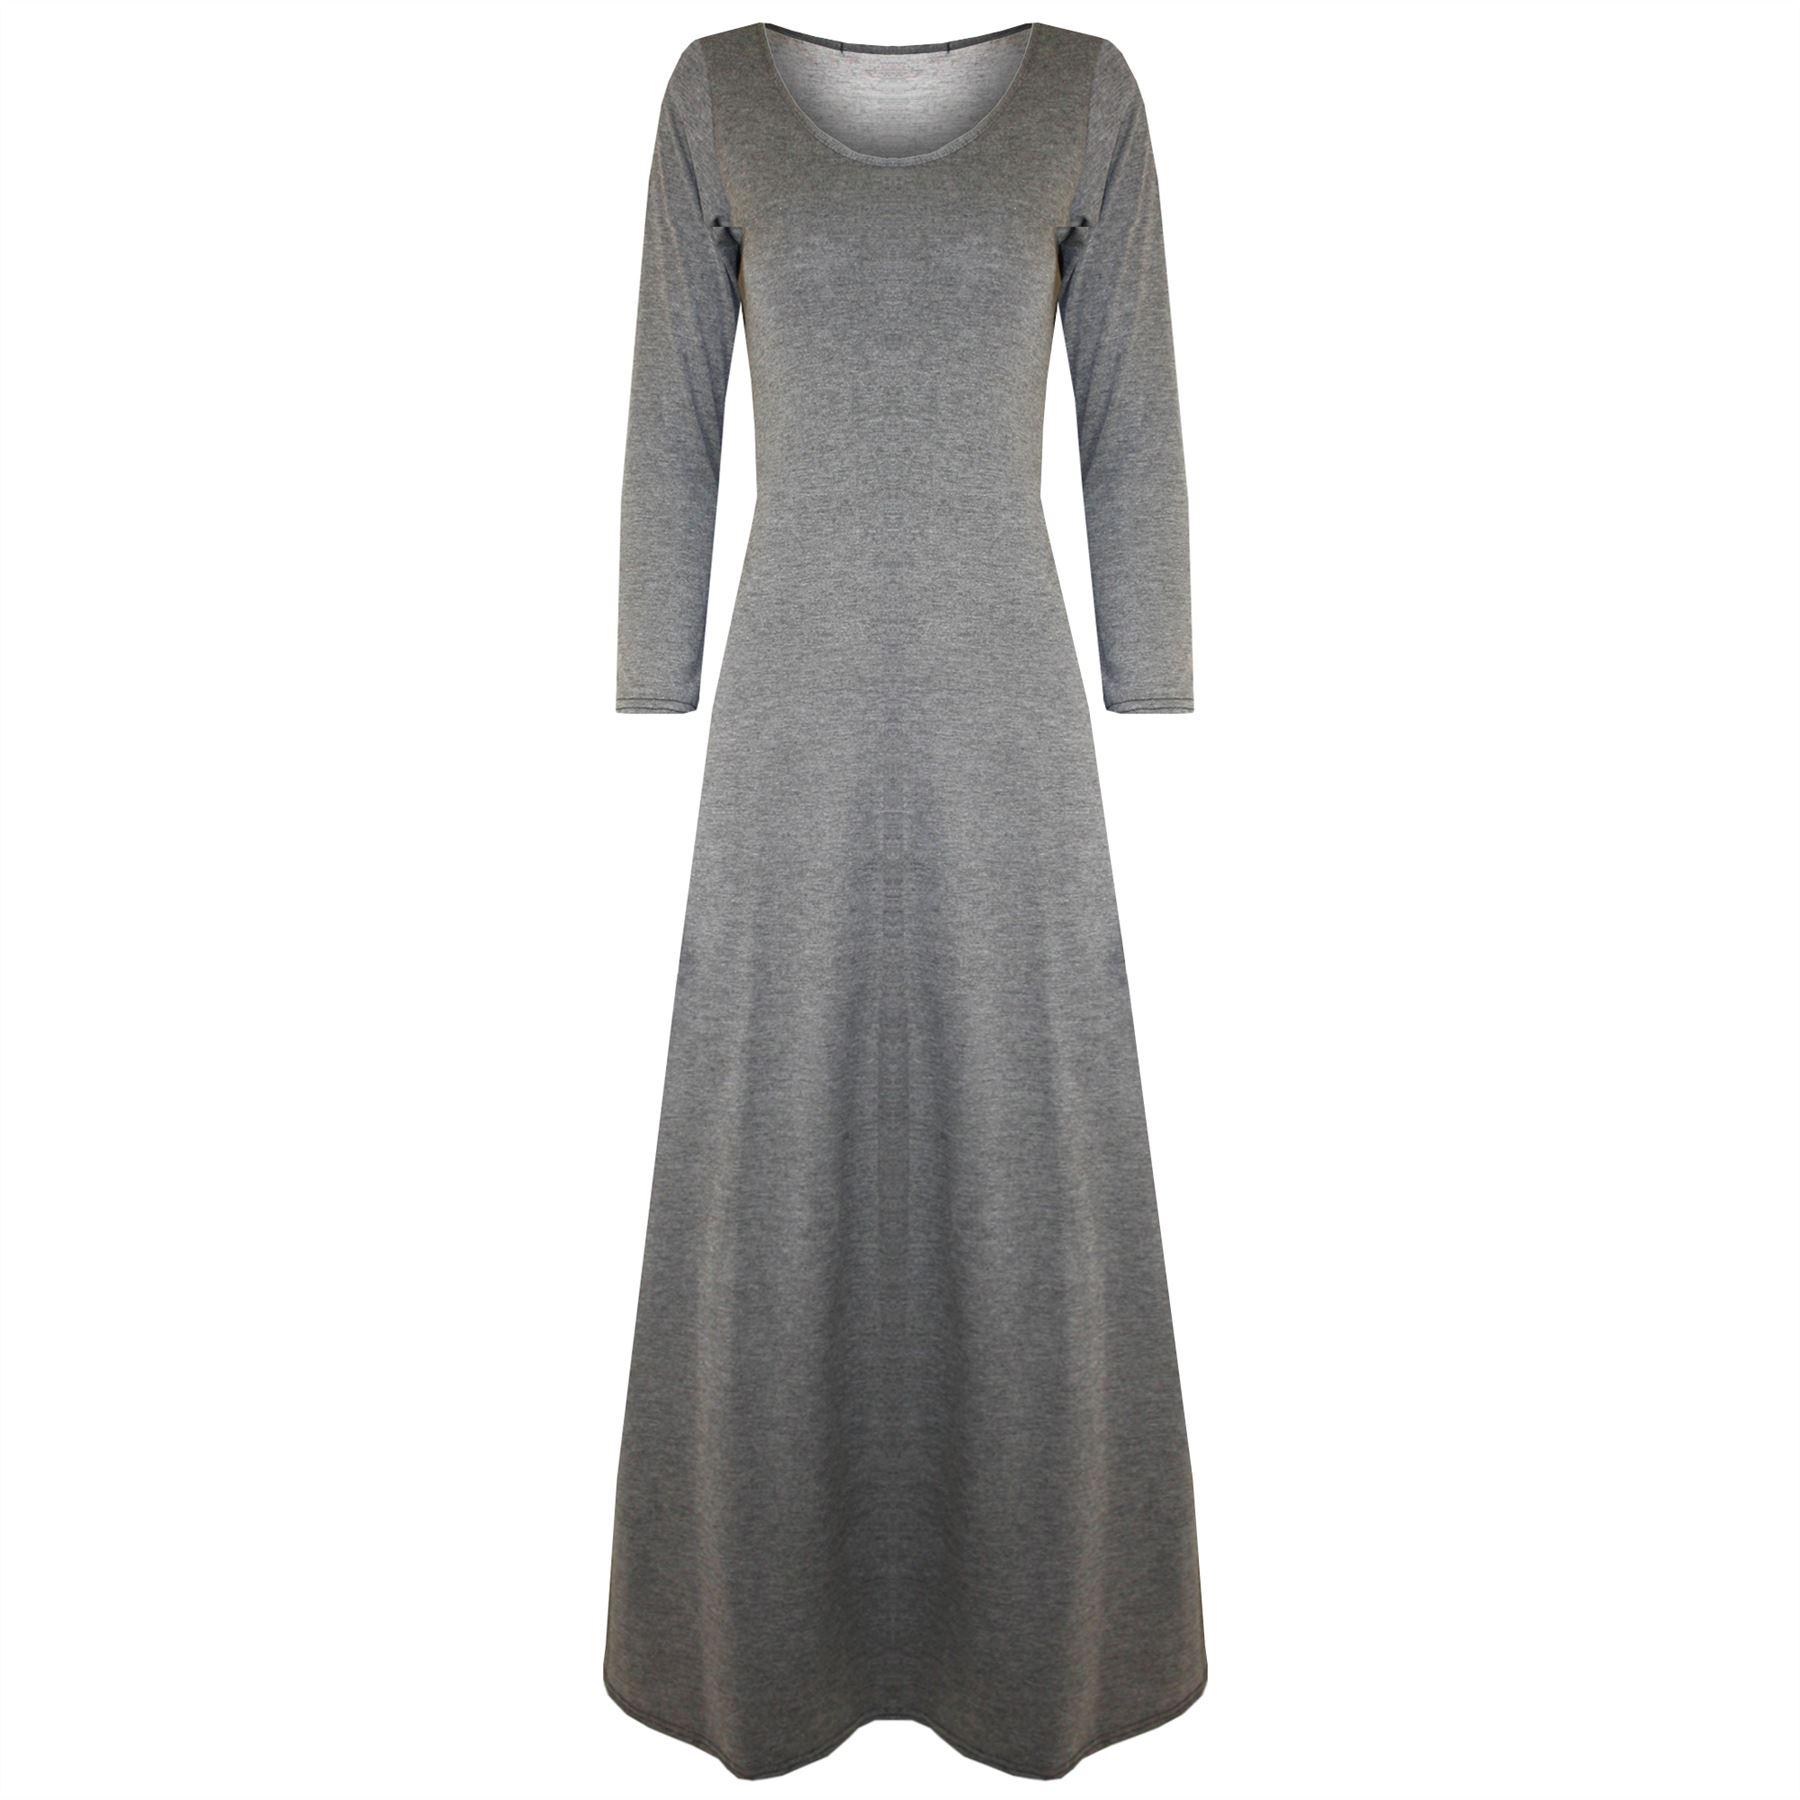 celebrity look alike maxi dresses uk